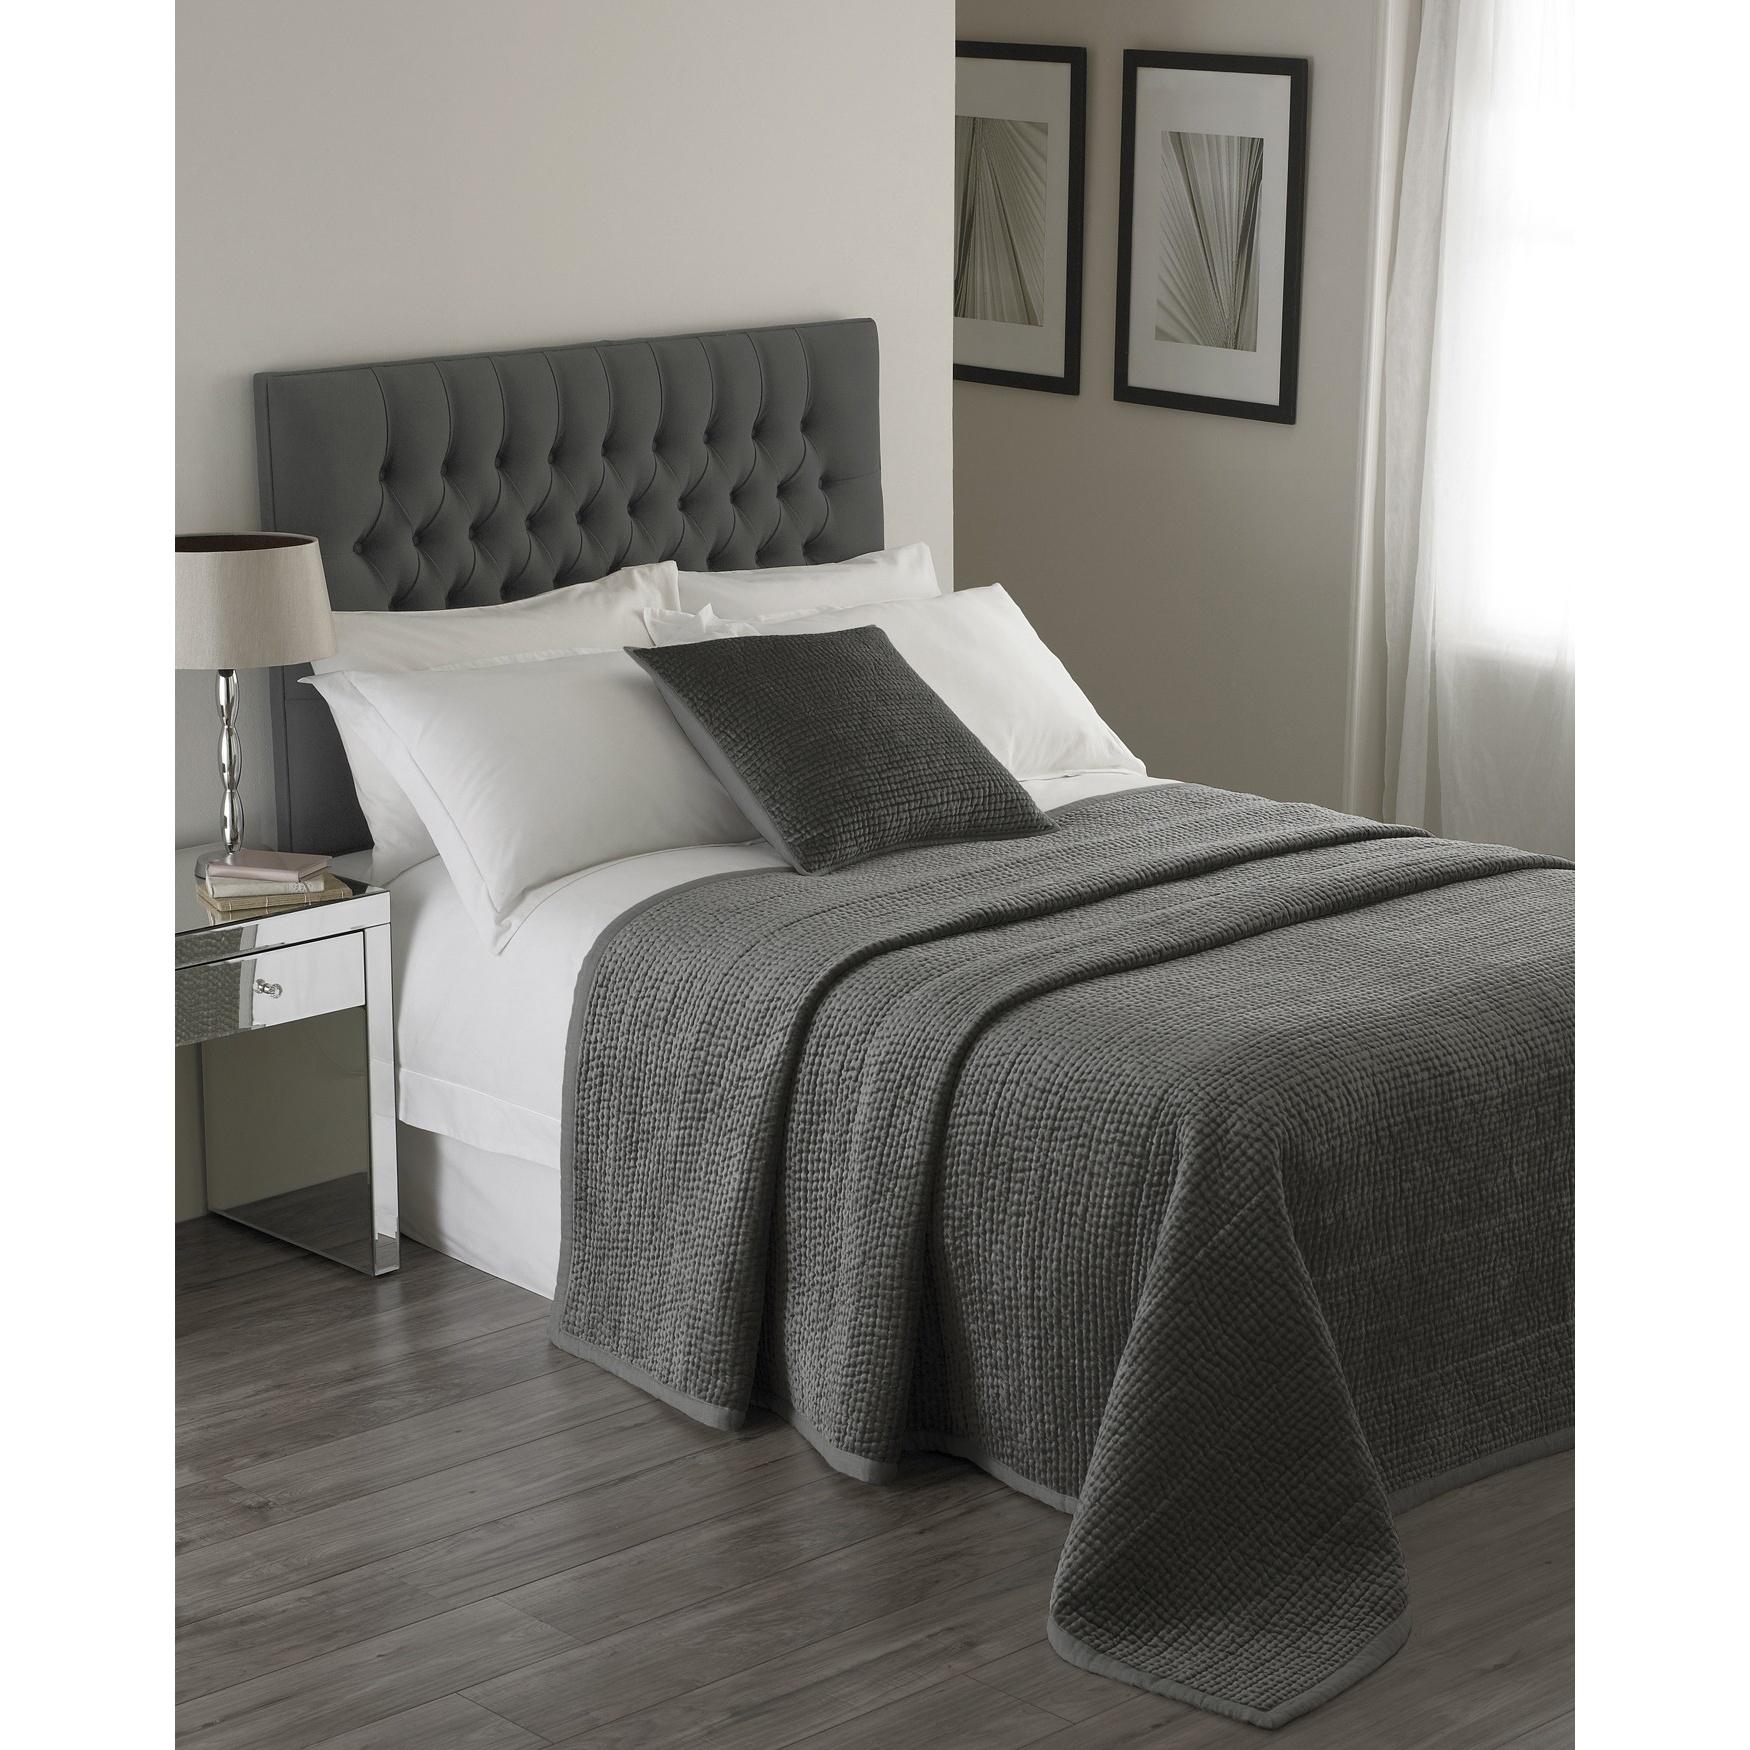 Riva Home Brooklands Bedspread (265x265cm) (Graphite)